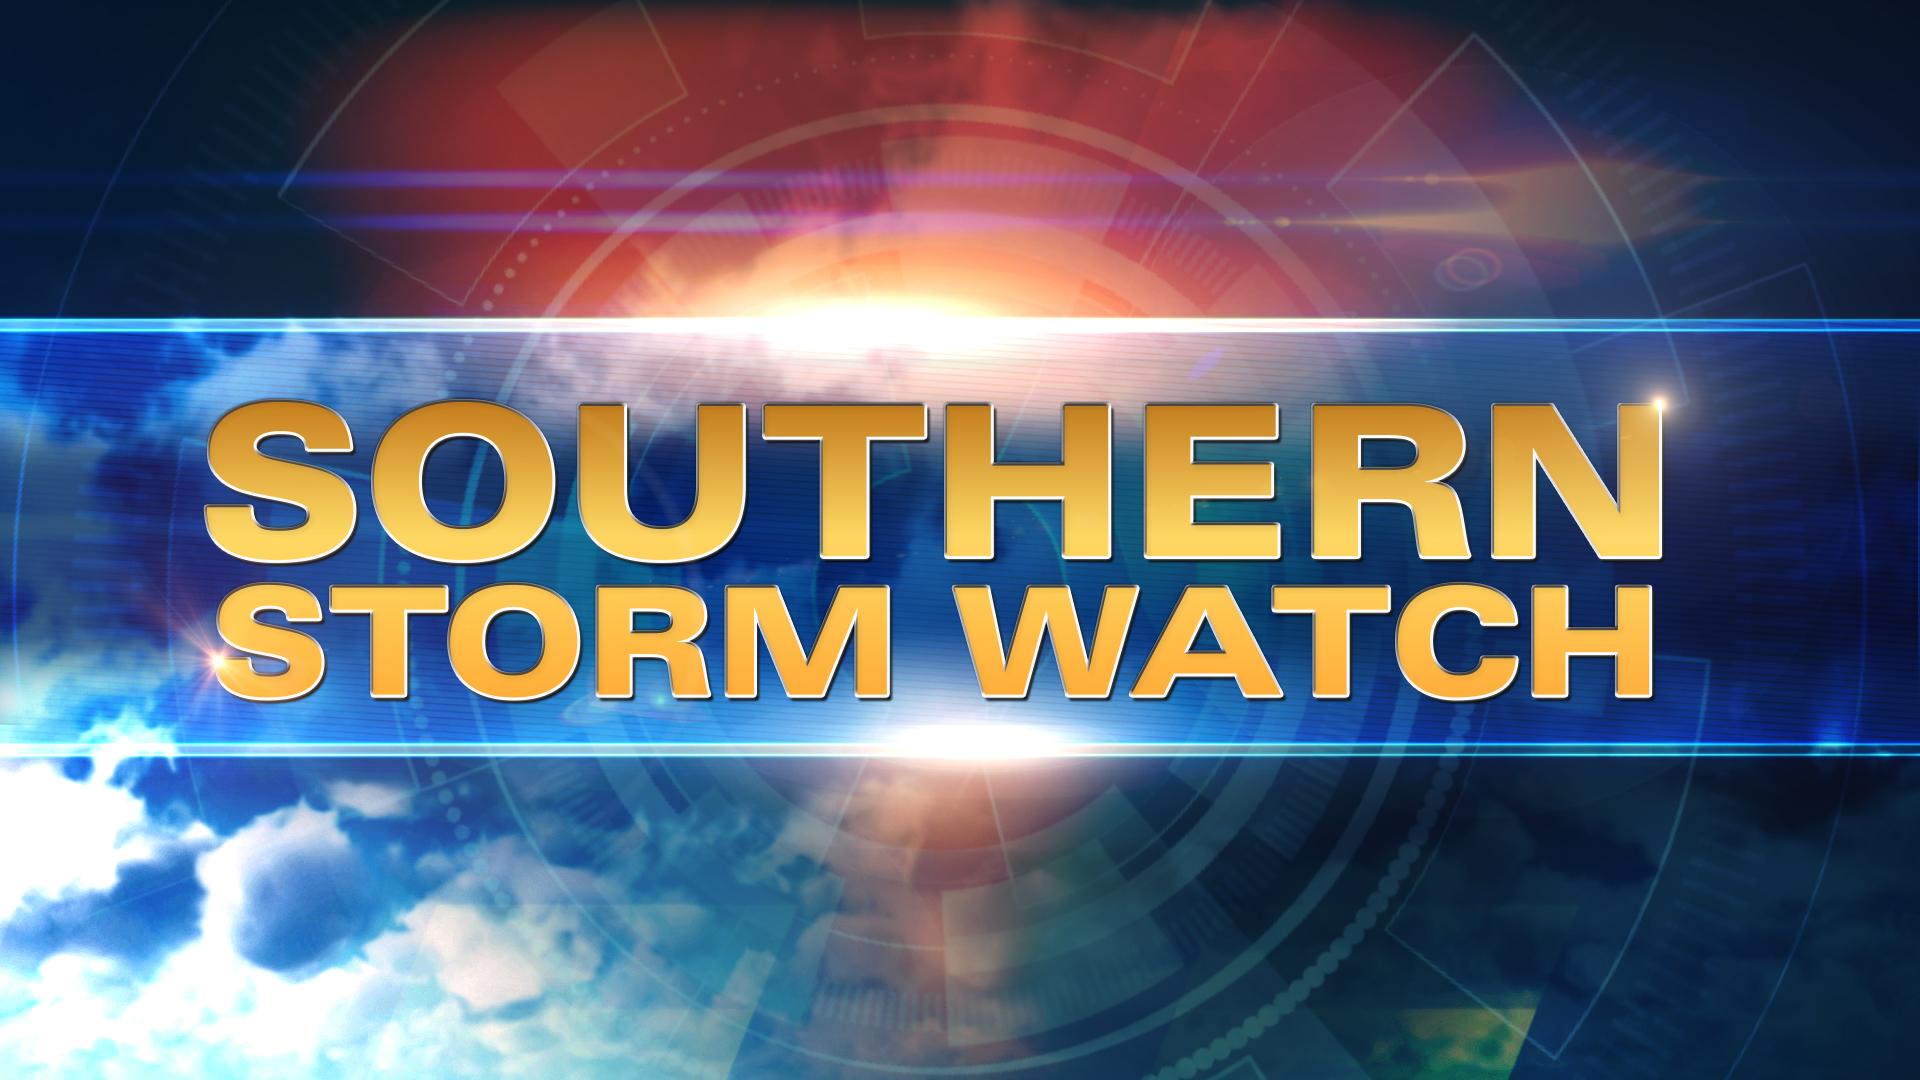 Southern Storm Watch_1555720624259.jpg.jpg